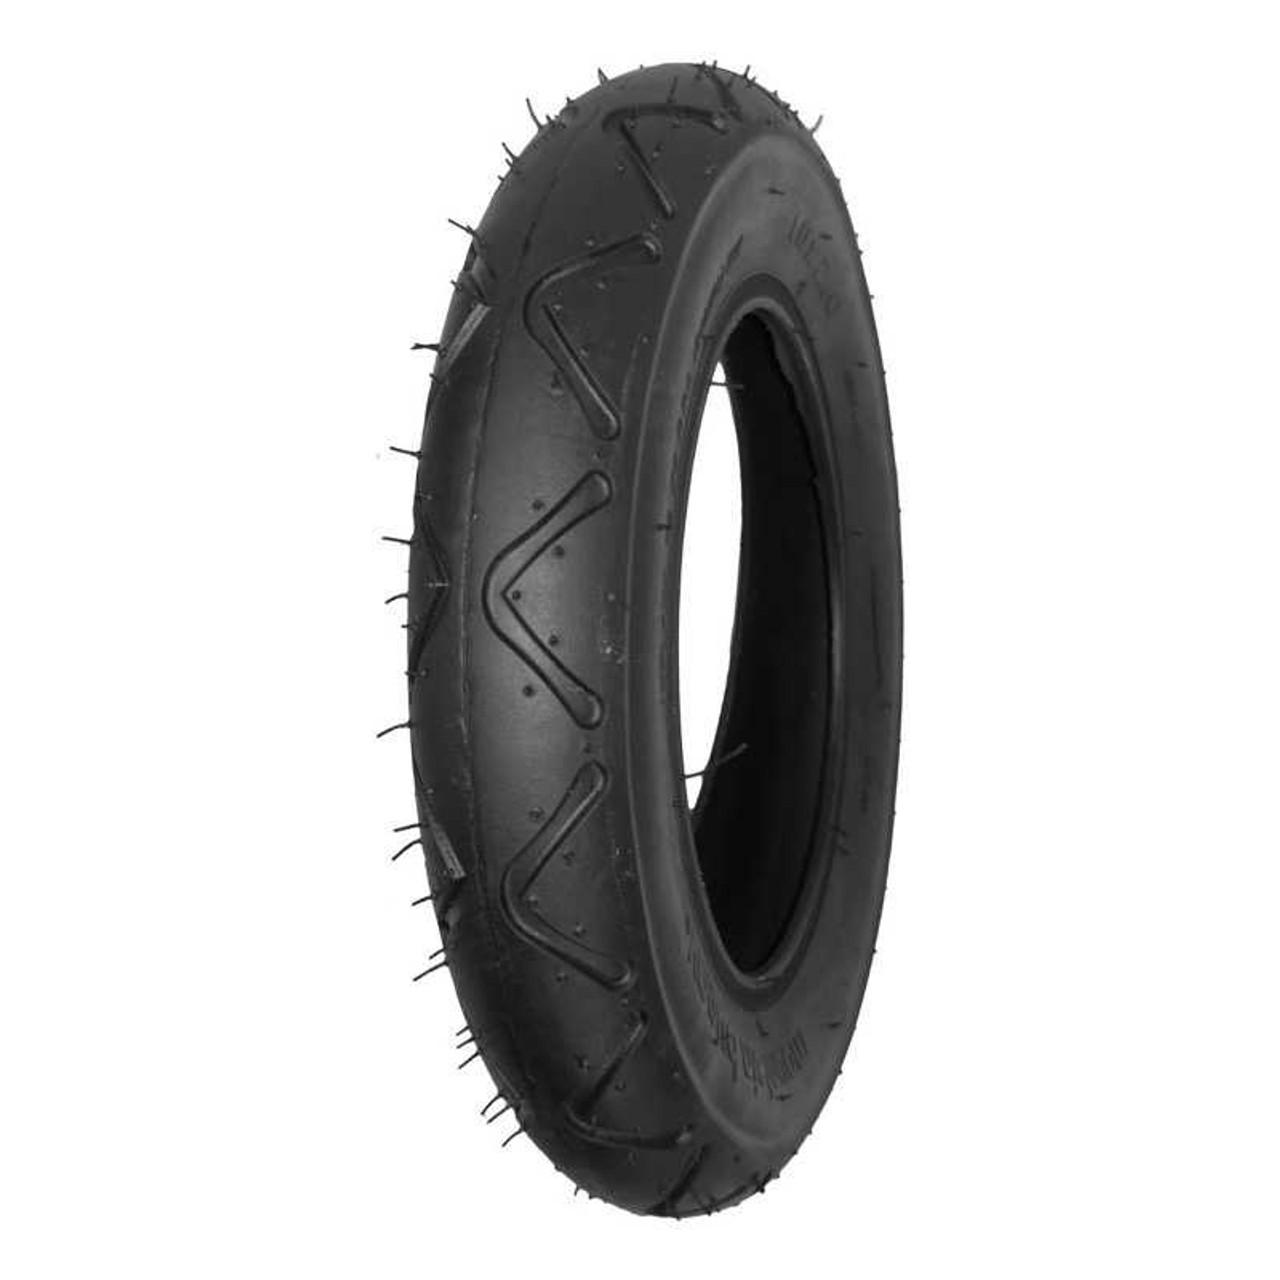 "Mountain Buggy Spare Part 10"" Pram Tyre Vend Uncategorized 18.95"